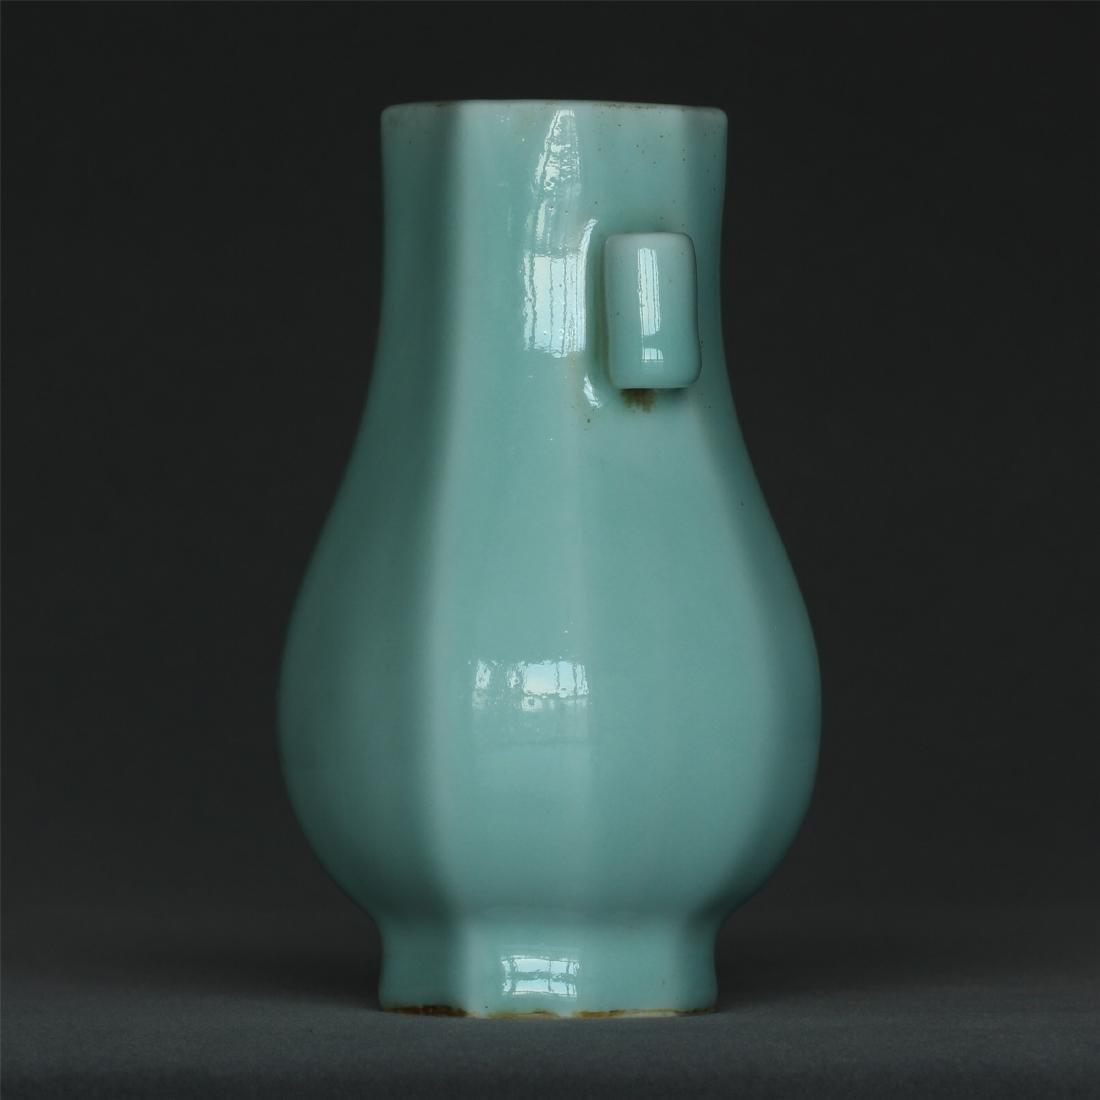 Blue glaze porcelain vase of Qing Dynasty QianLong - 4